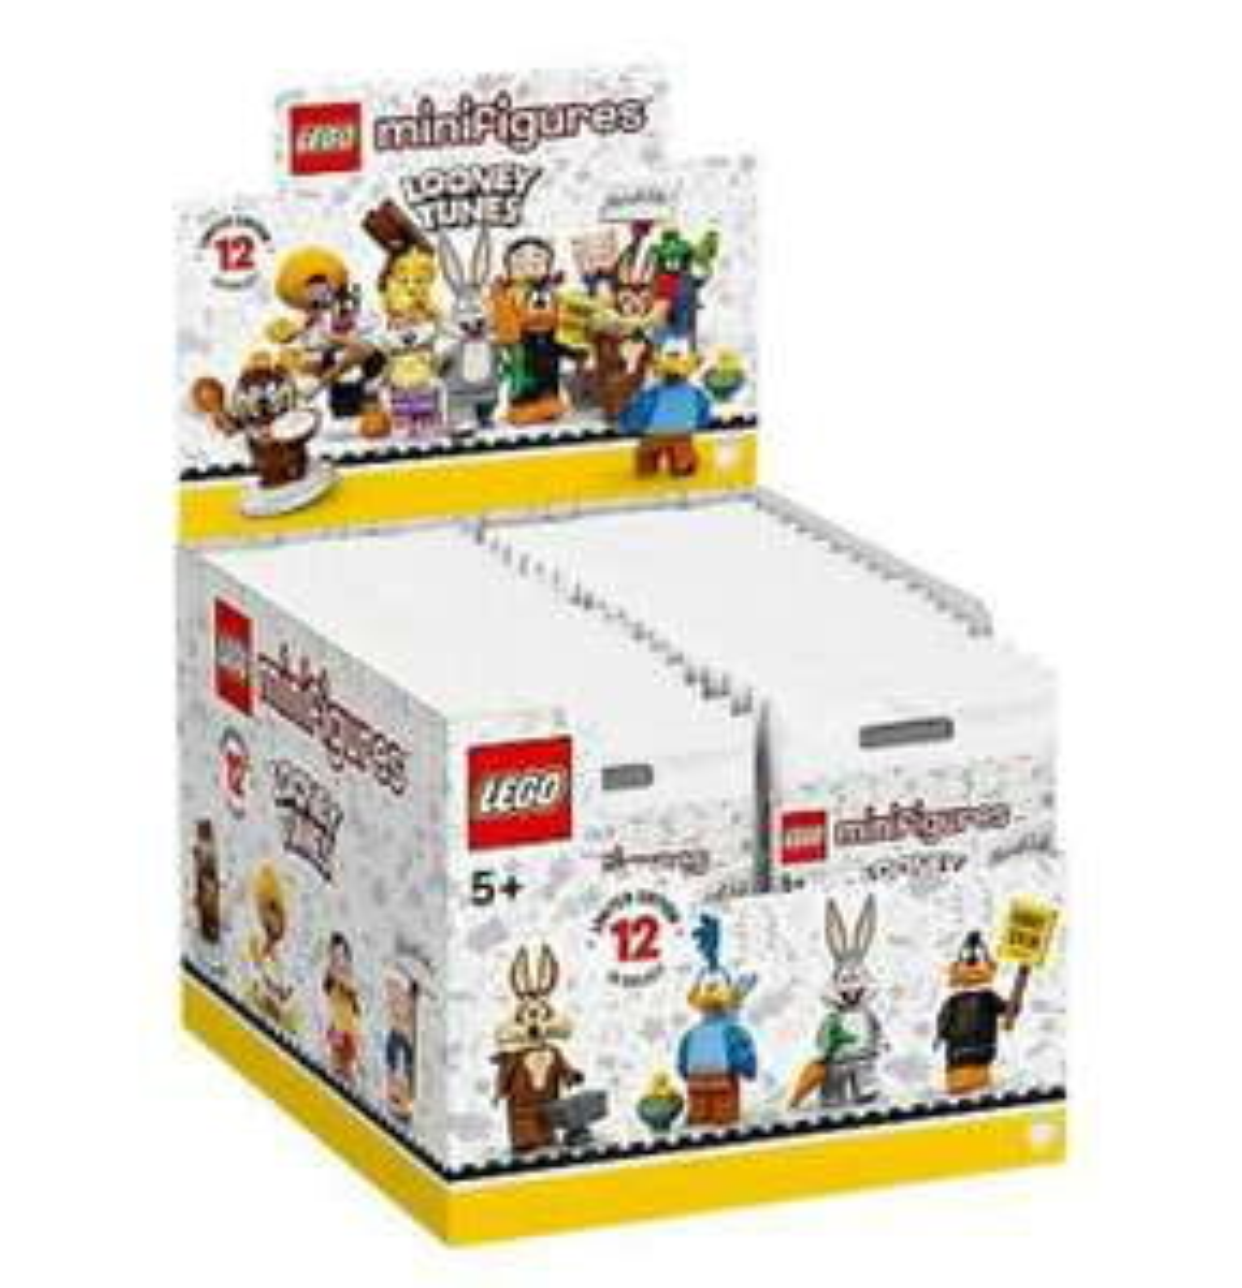 LEGO 71030 Minifigures - Looney Tunes (Sealed Box Of 36) £98.59 at eBay -Toysbarnhaus